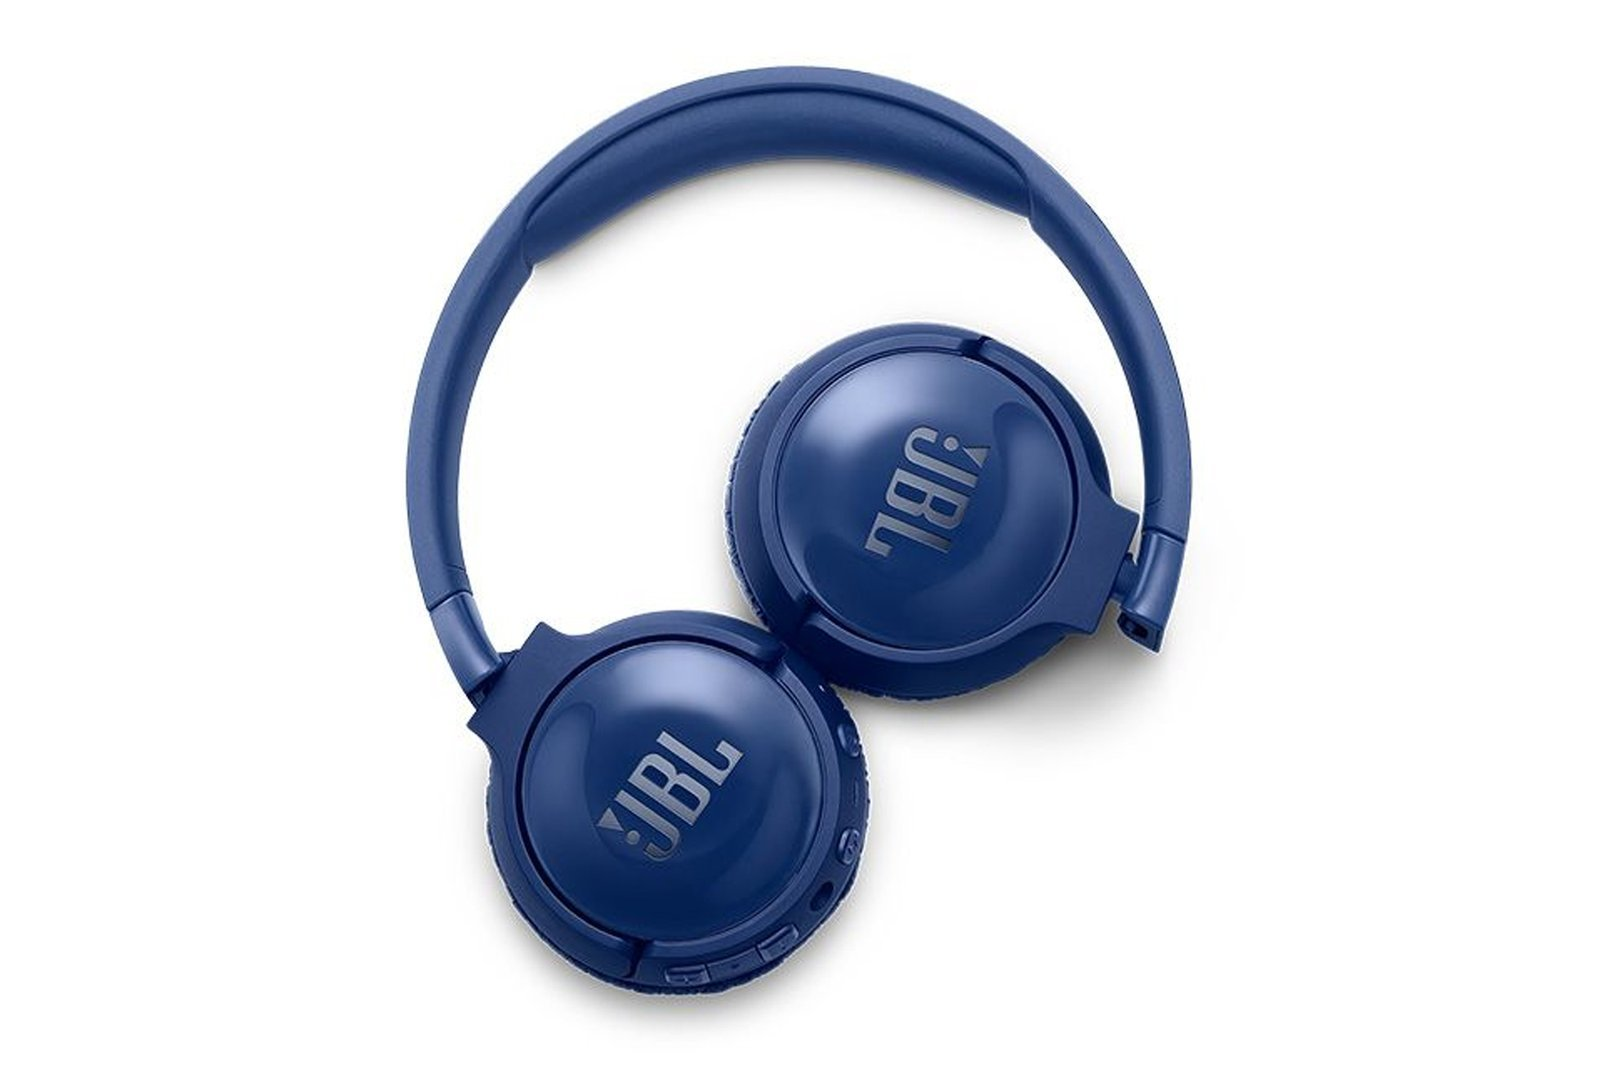 New Wireless Over-ear Noise-cancelling Headphones JBL 600BTNC TUNE600BTNC Blue